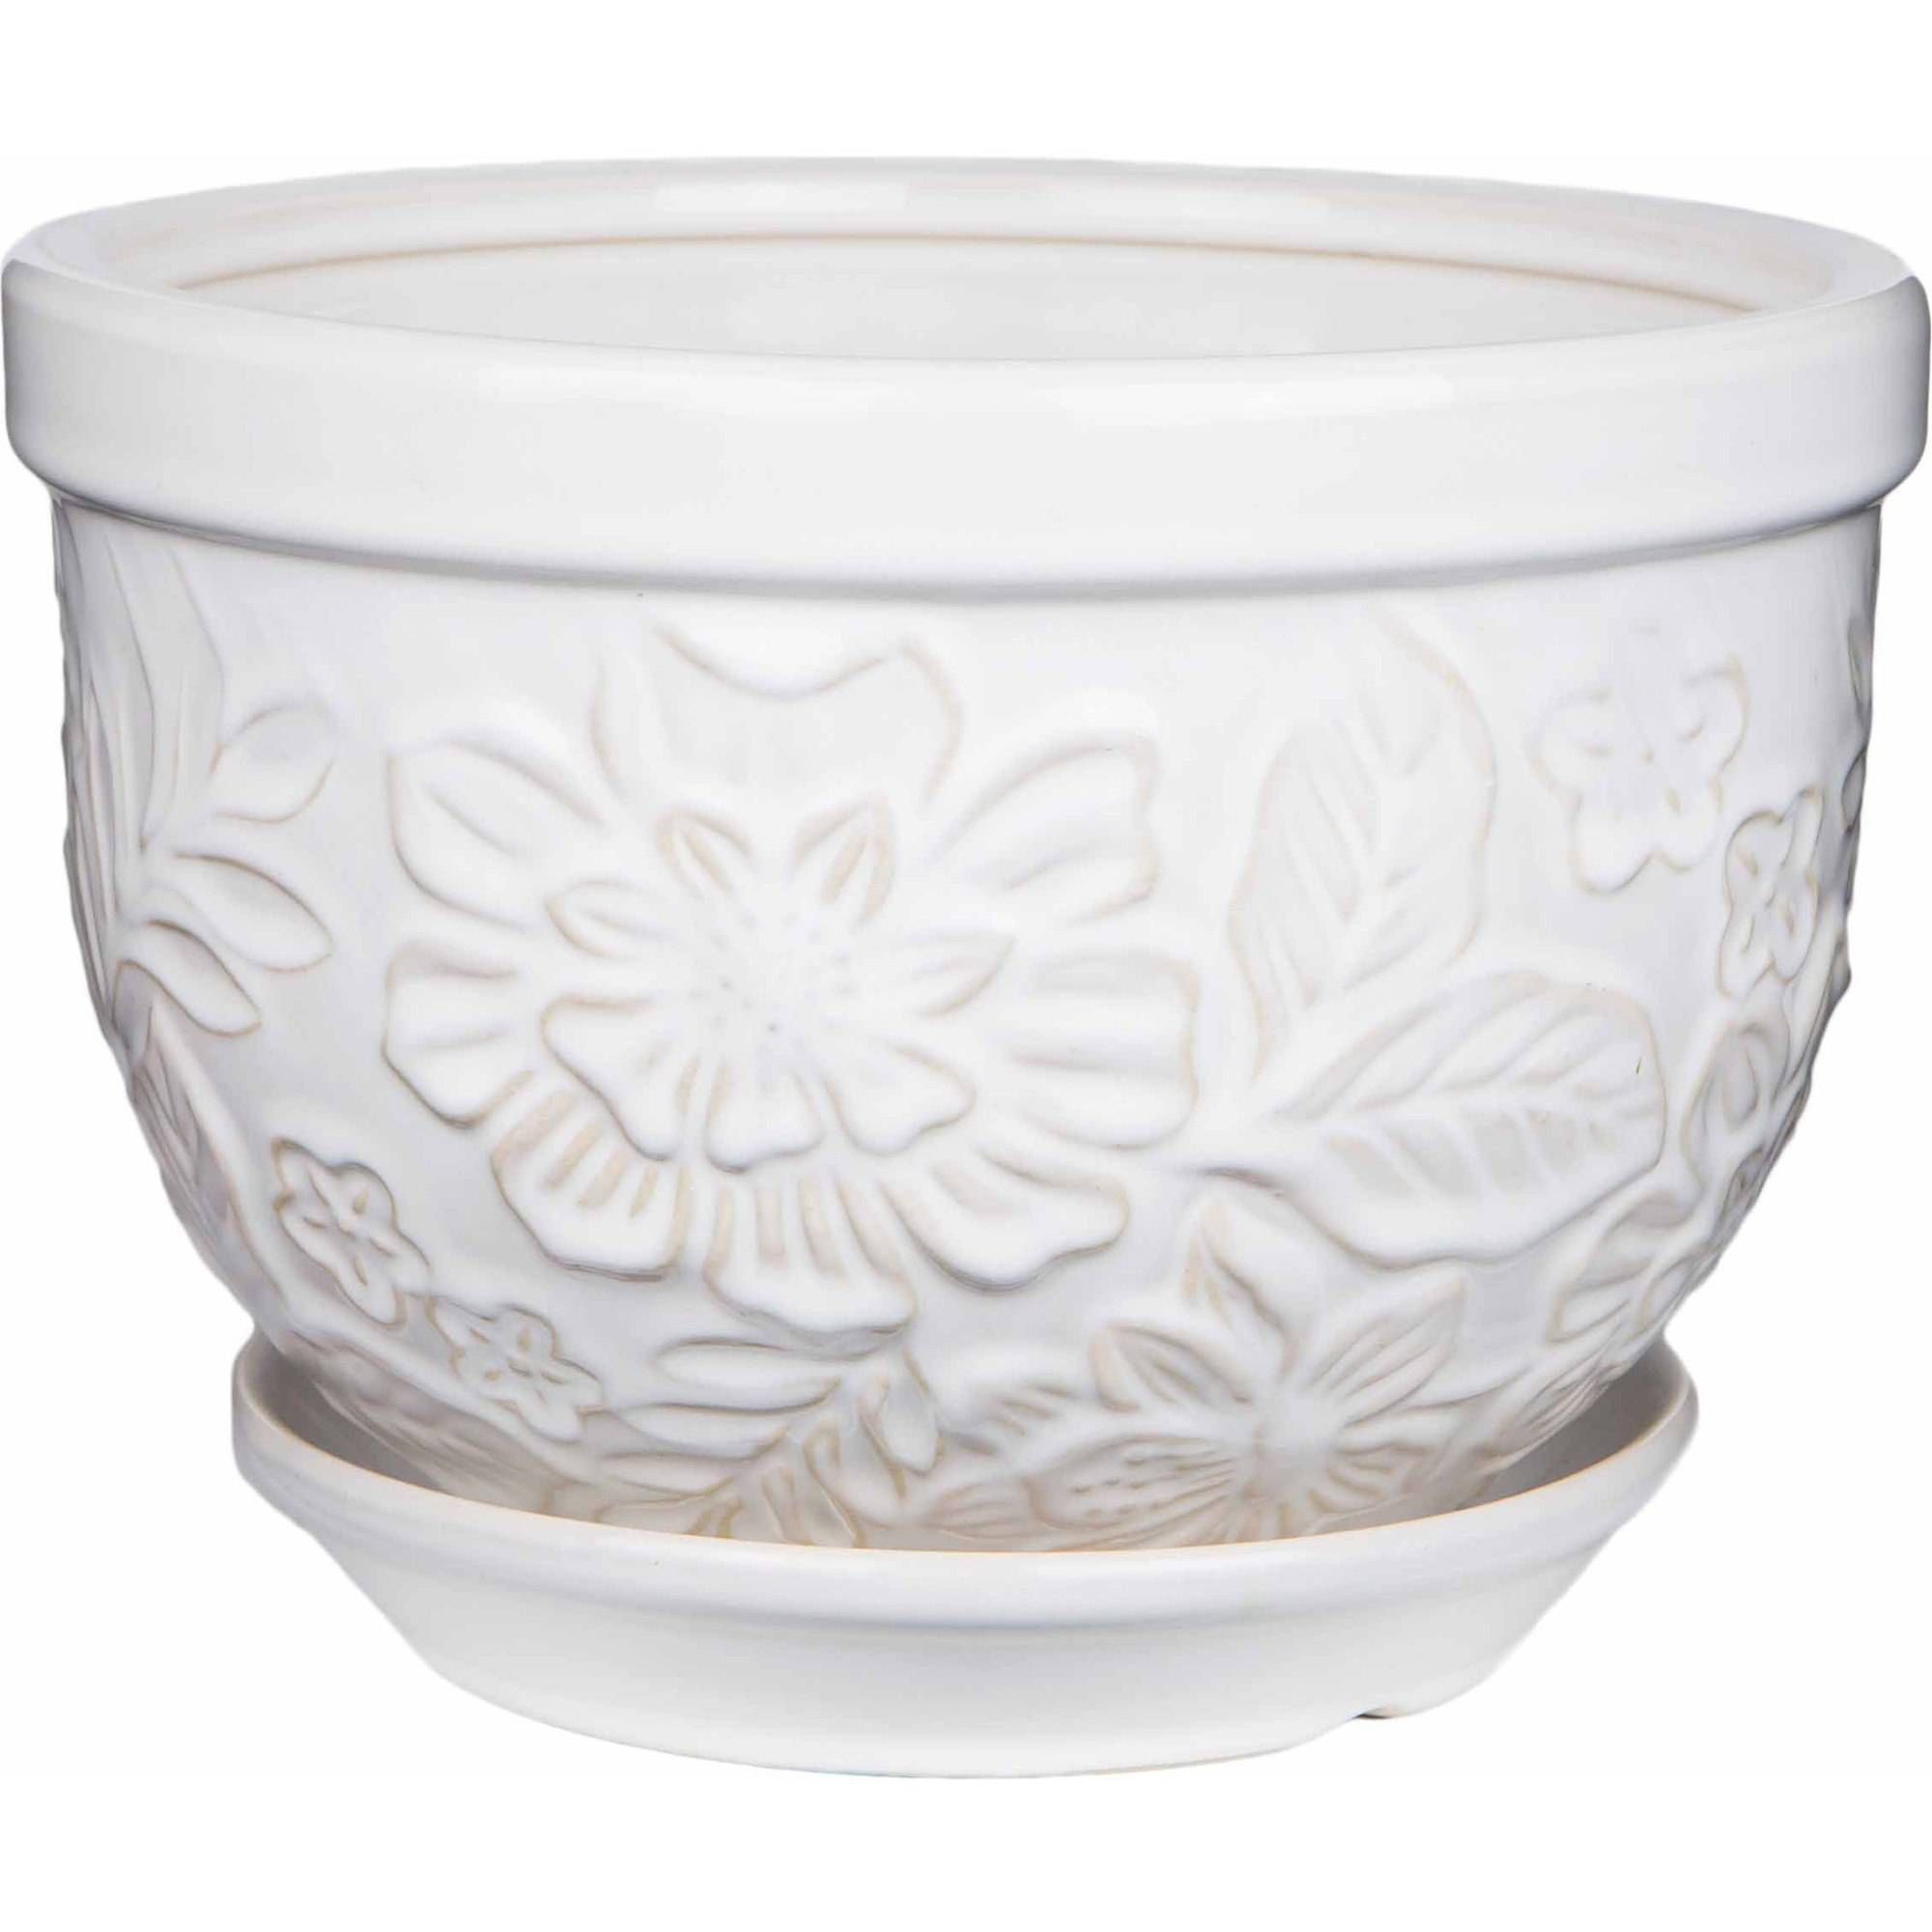 Pennington Ceramic Vintage Floral Pot Planter 12 Inch